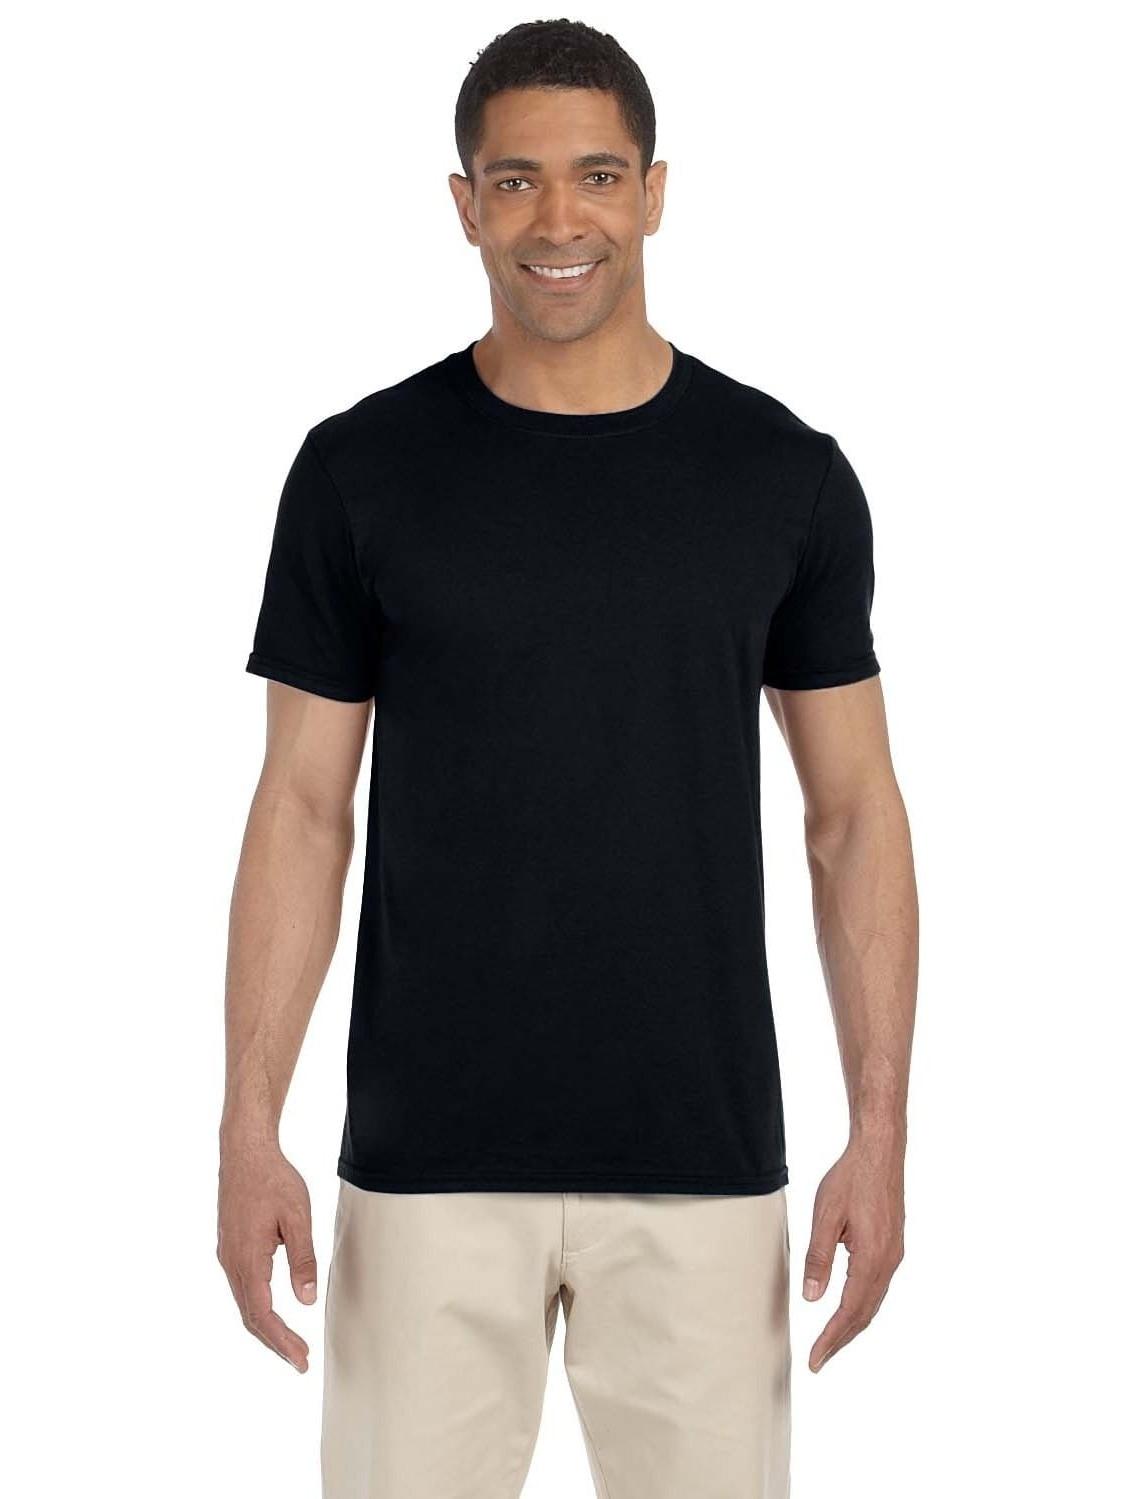 Gildan  Men's Black Softstyle Undershirts (Pack of 9)